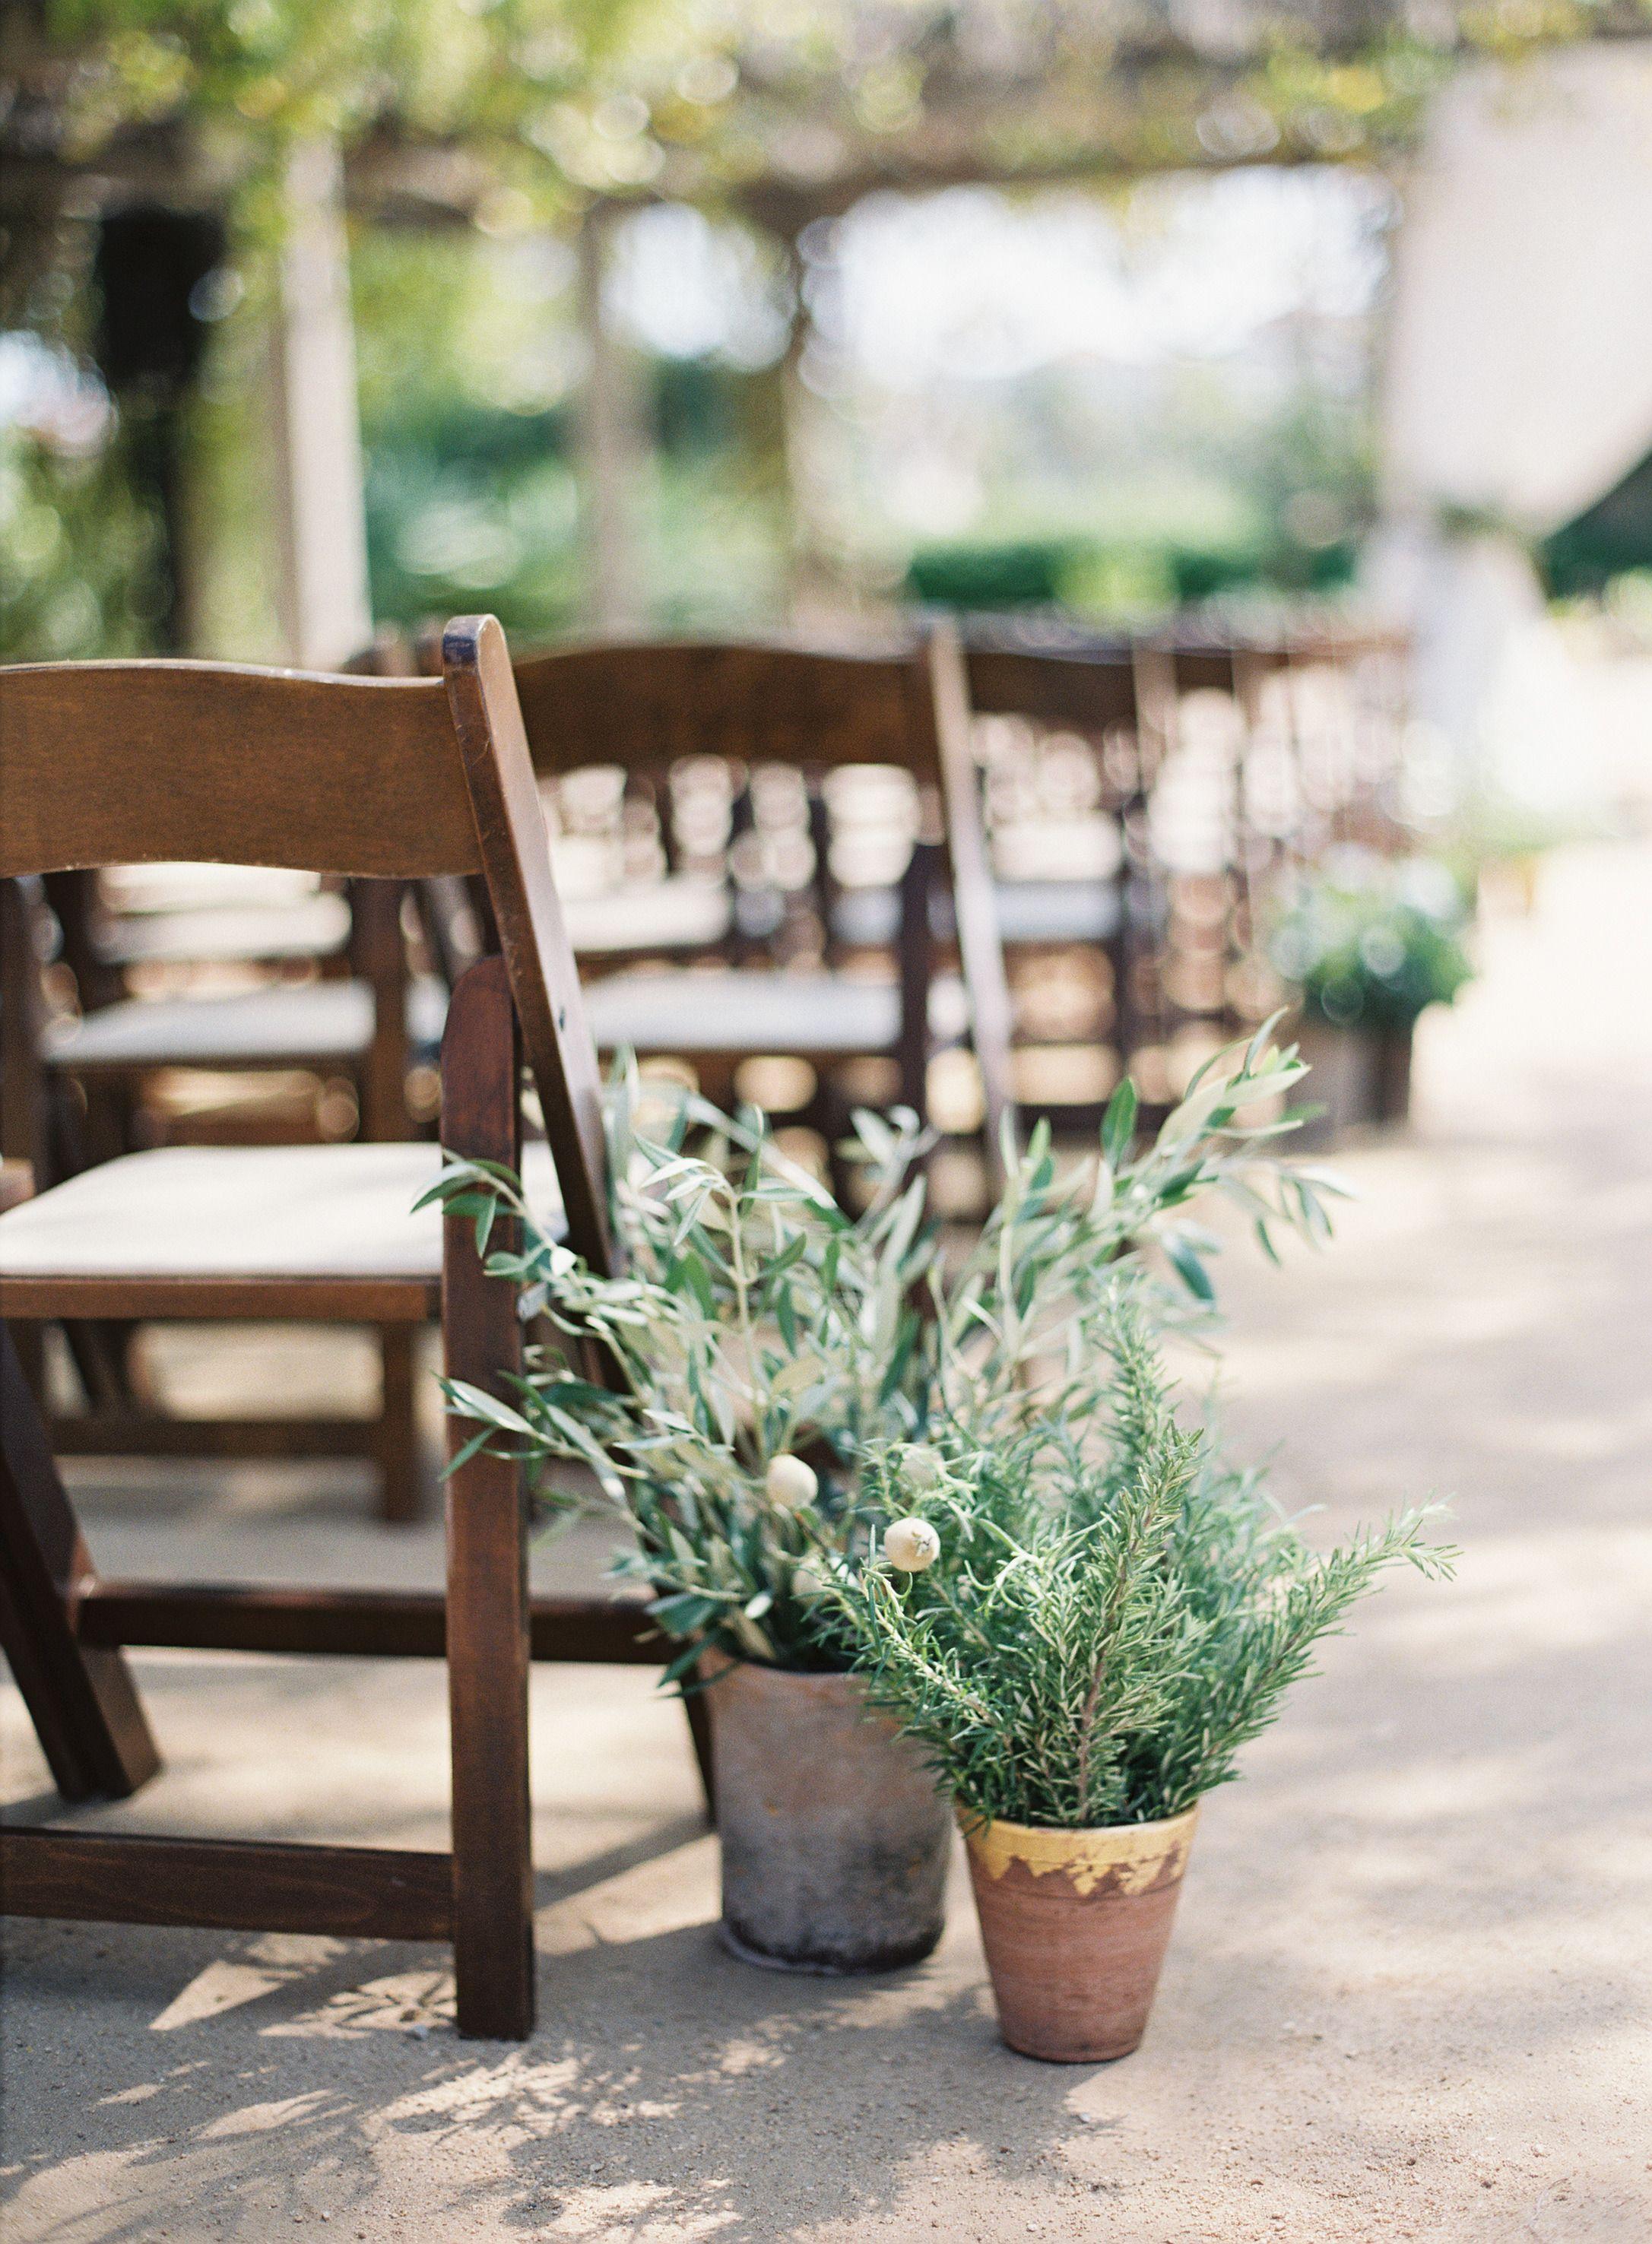 Potted Plants Lining Isle | Photography: Patrick Moyer Photography - patmoyerweddings.com Read More: http://www.stylemepretty.com/2015/01/28/rustic-glam-santa-barbara-wedding/